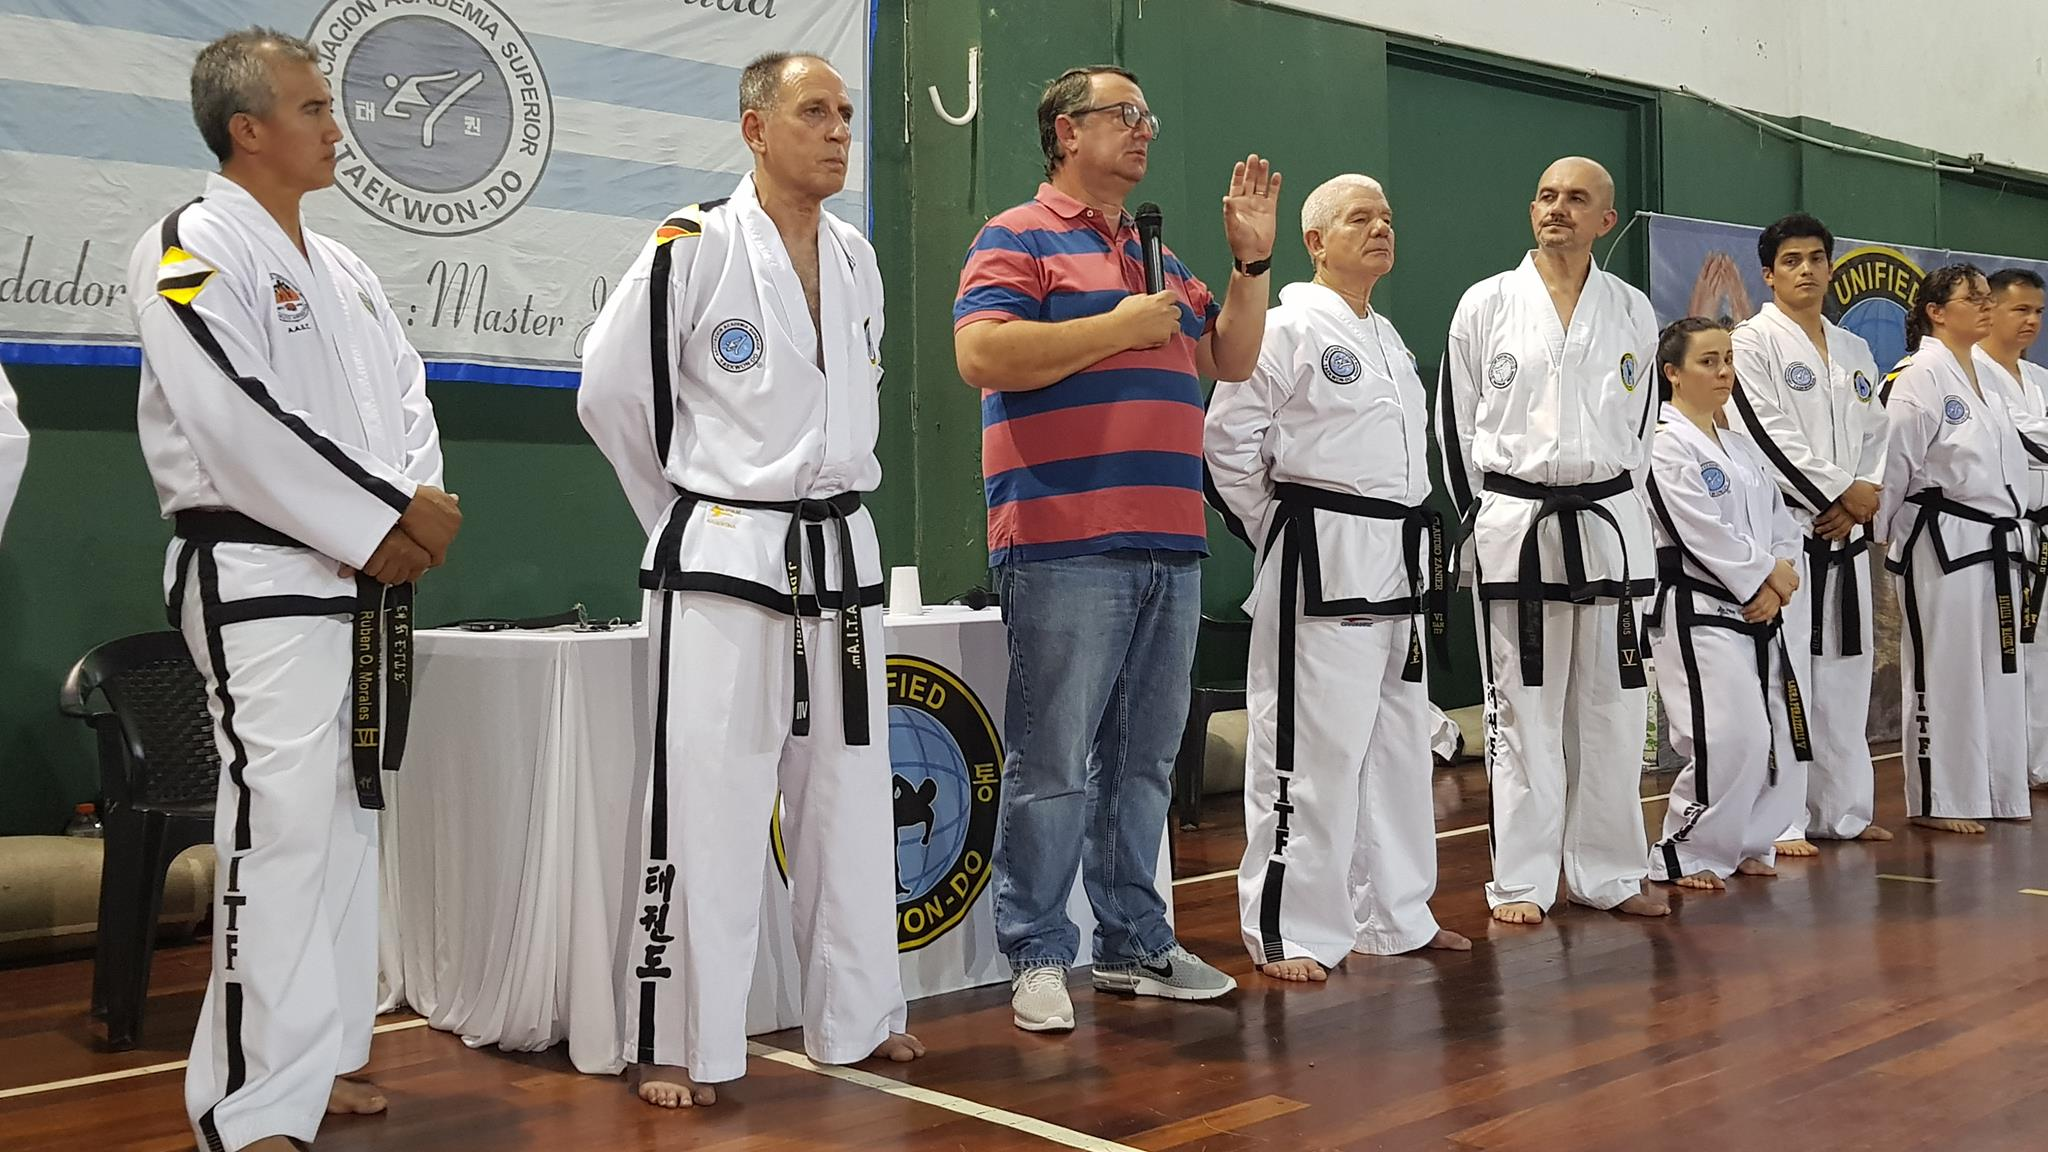 La última Master Class de Taekwondo del año cerró con gran éxito de convocatoria